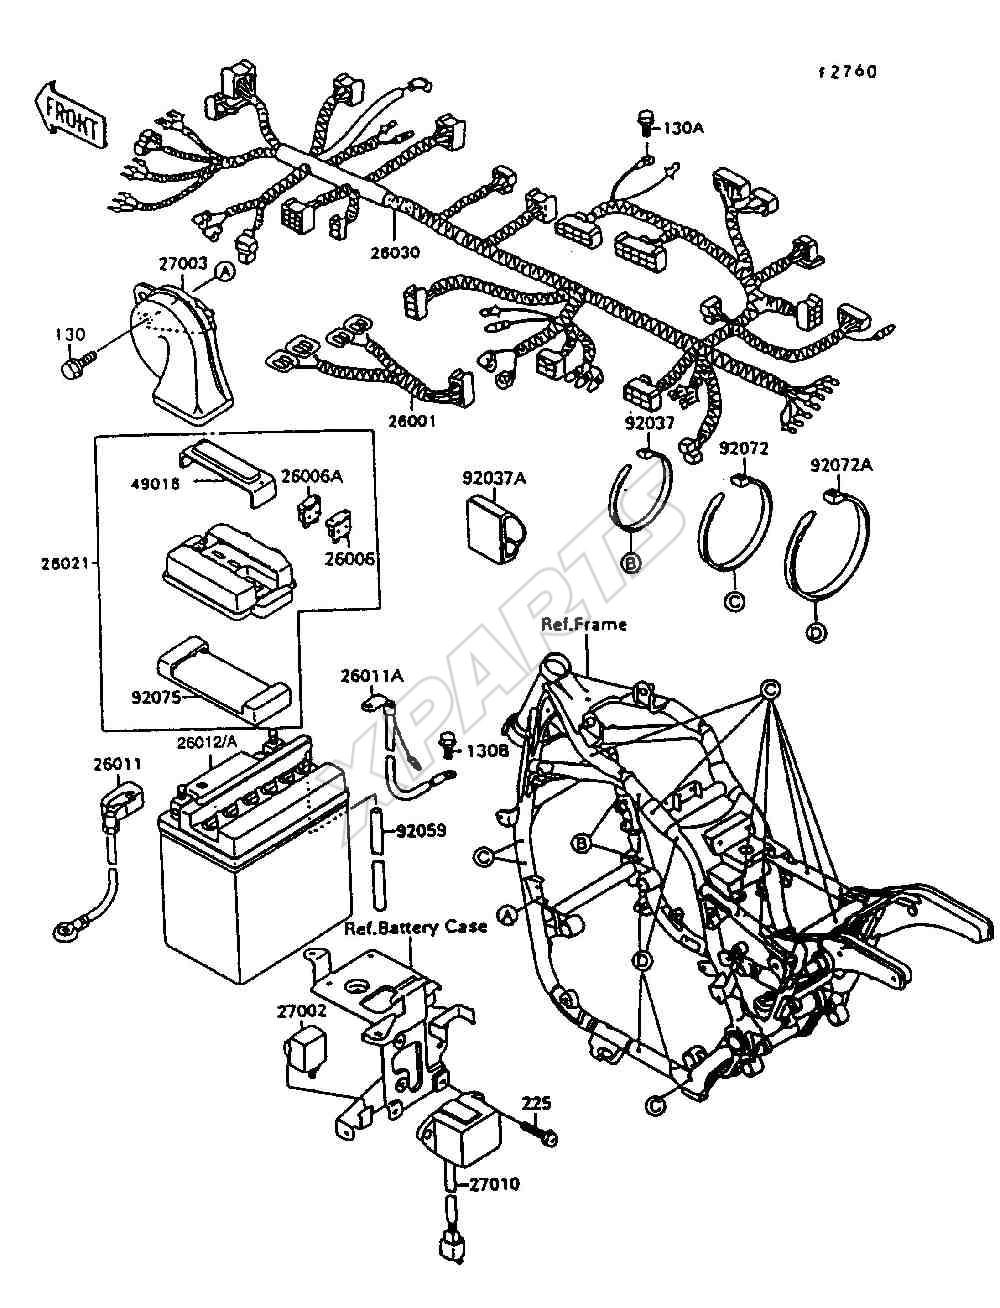 Dx 7366 Kawasaki Vn1500 Wiring Diagram Download Diagram